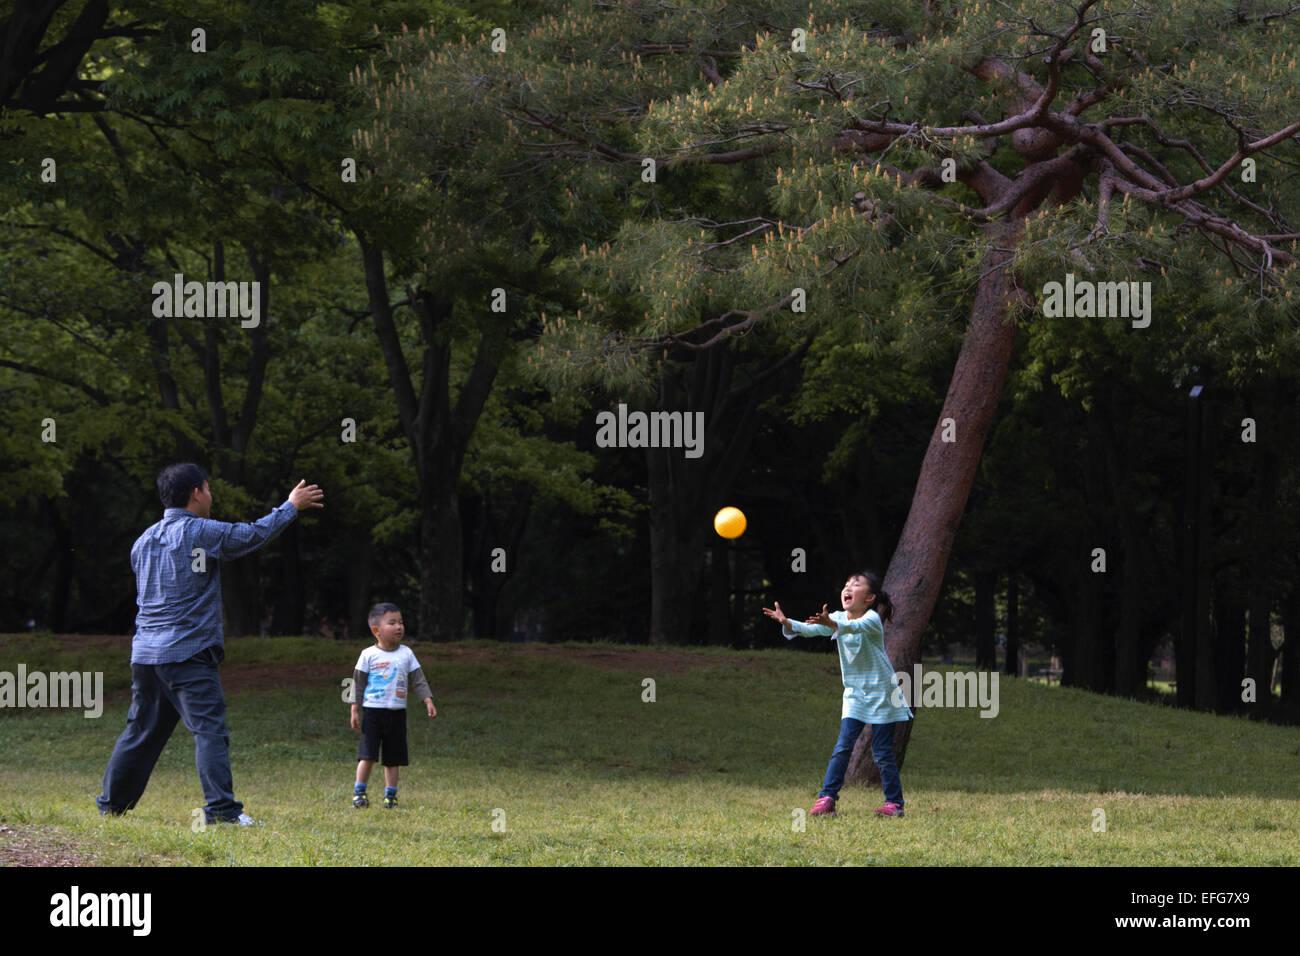 Man and children playing catch in Yoyogi park, Harajuku, Tokyo, Japan - Stock Image